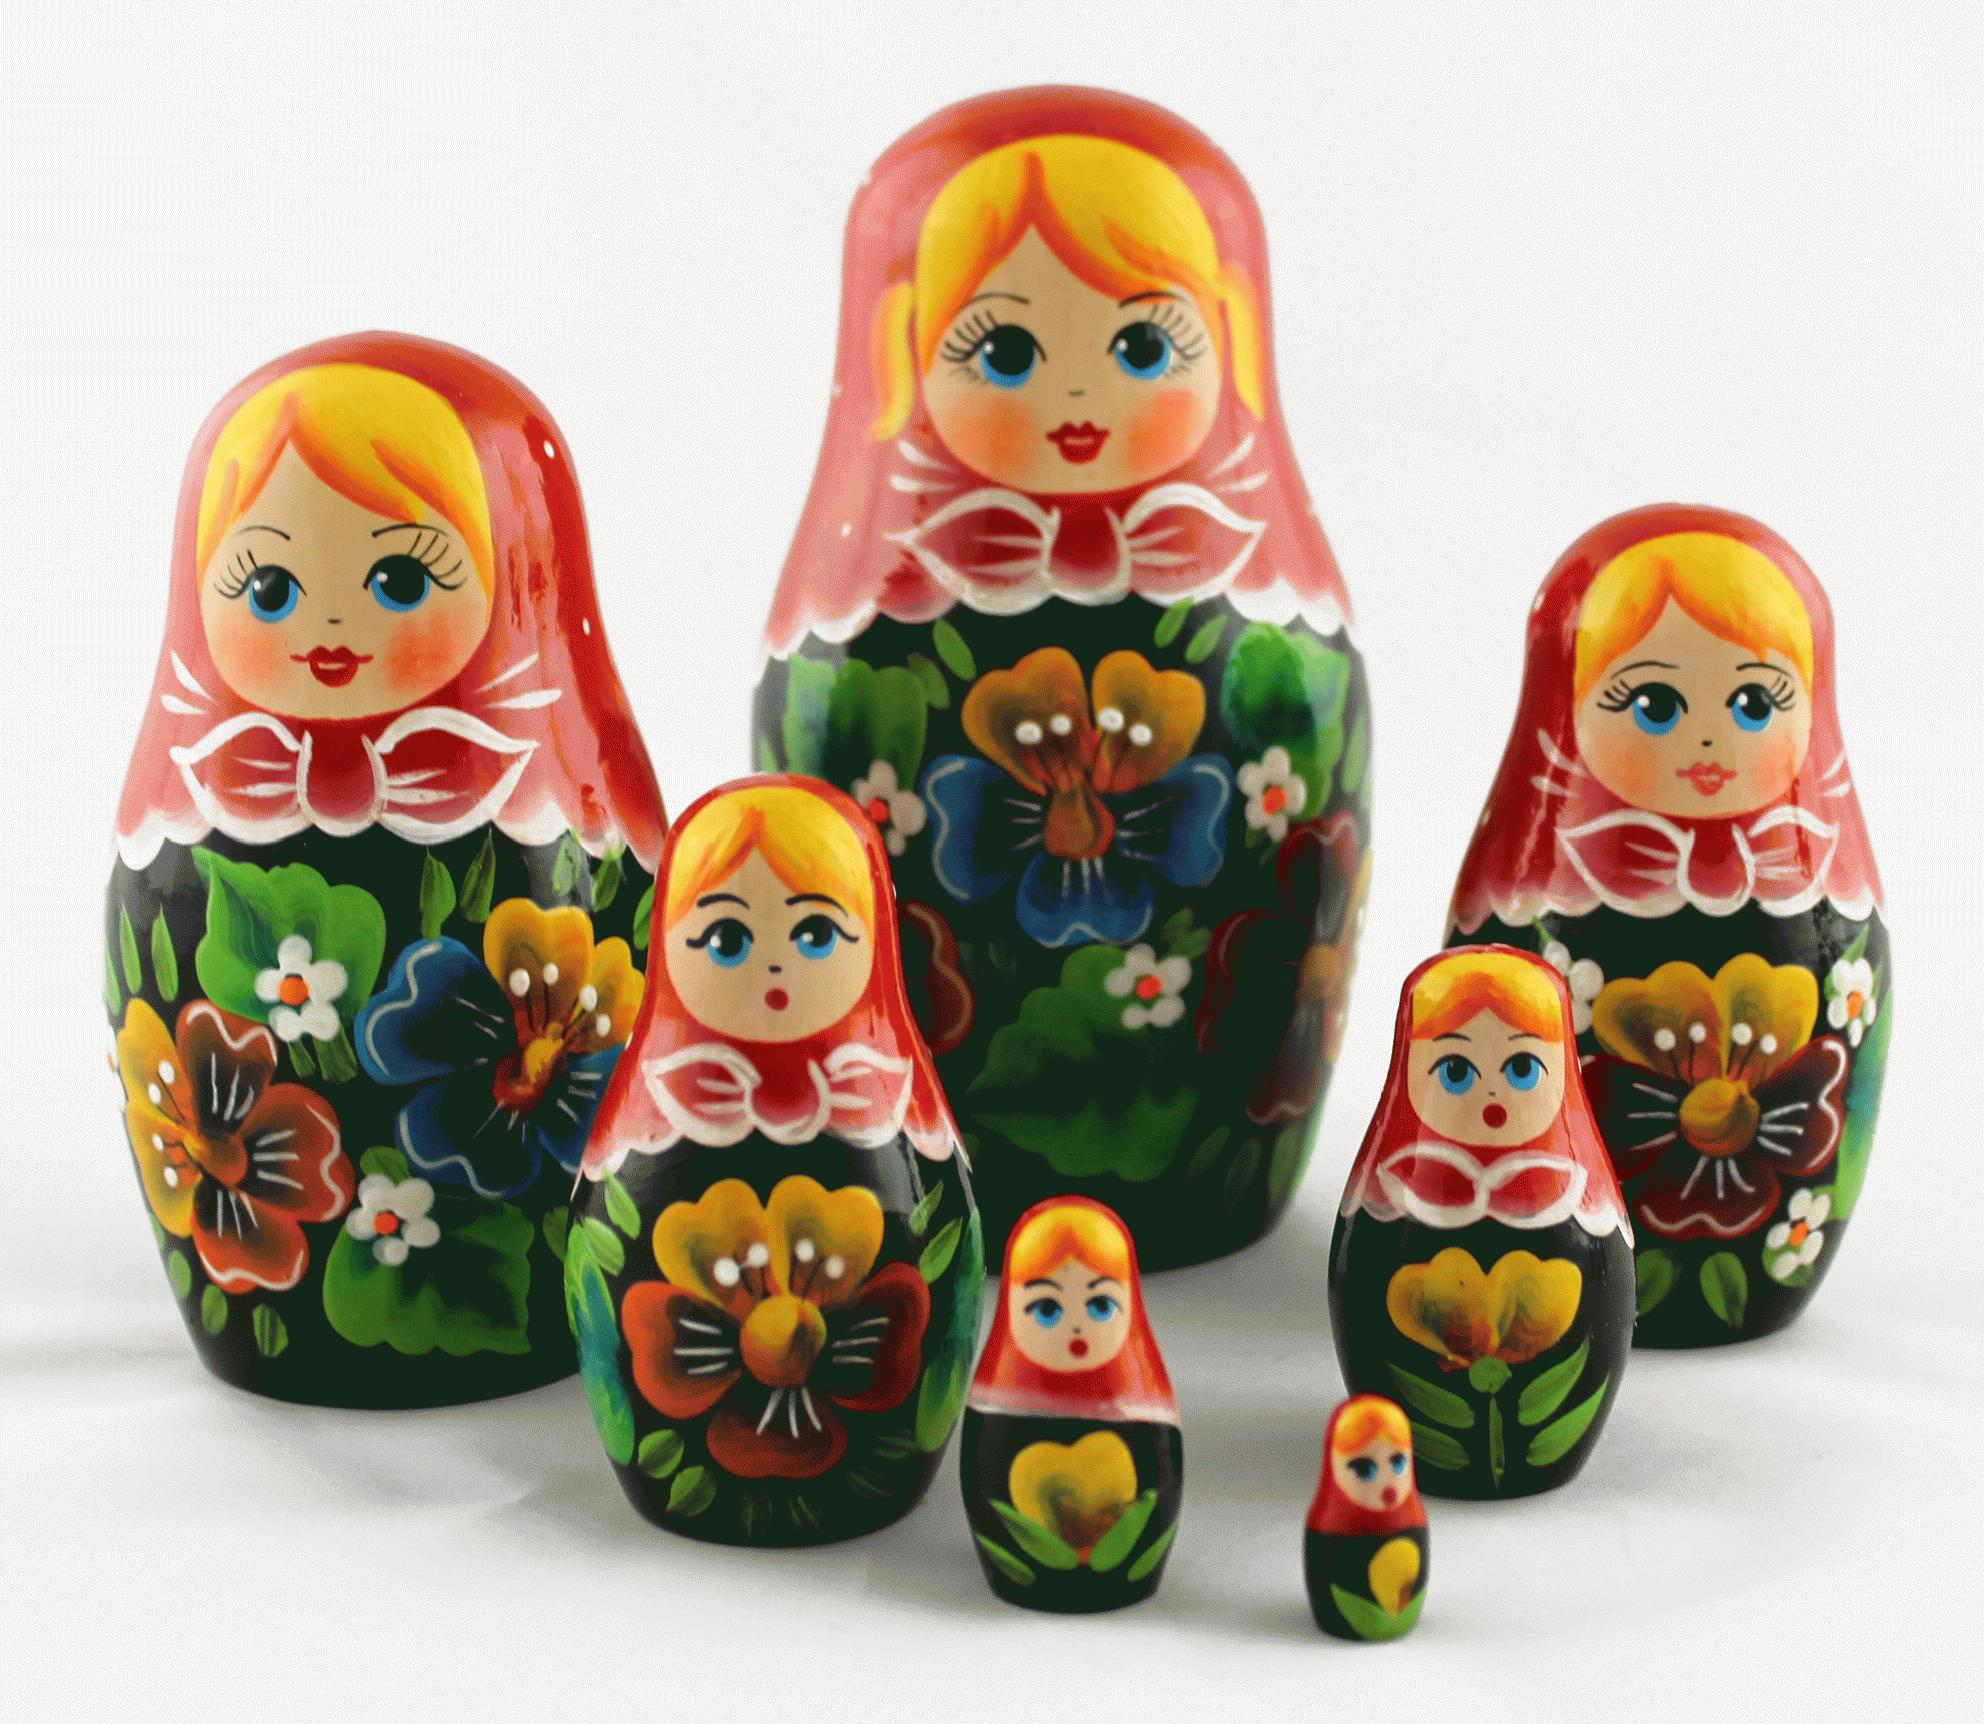 Детские картинки игрушки матрешки